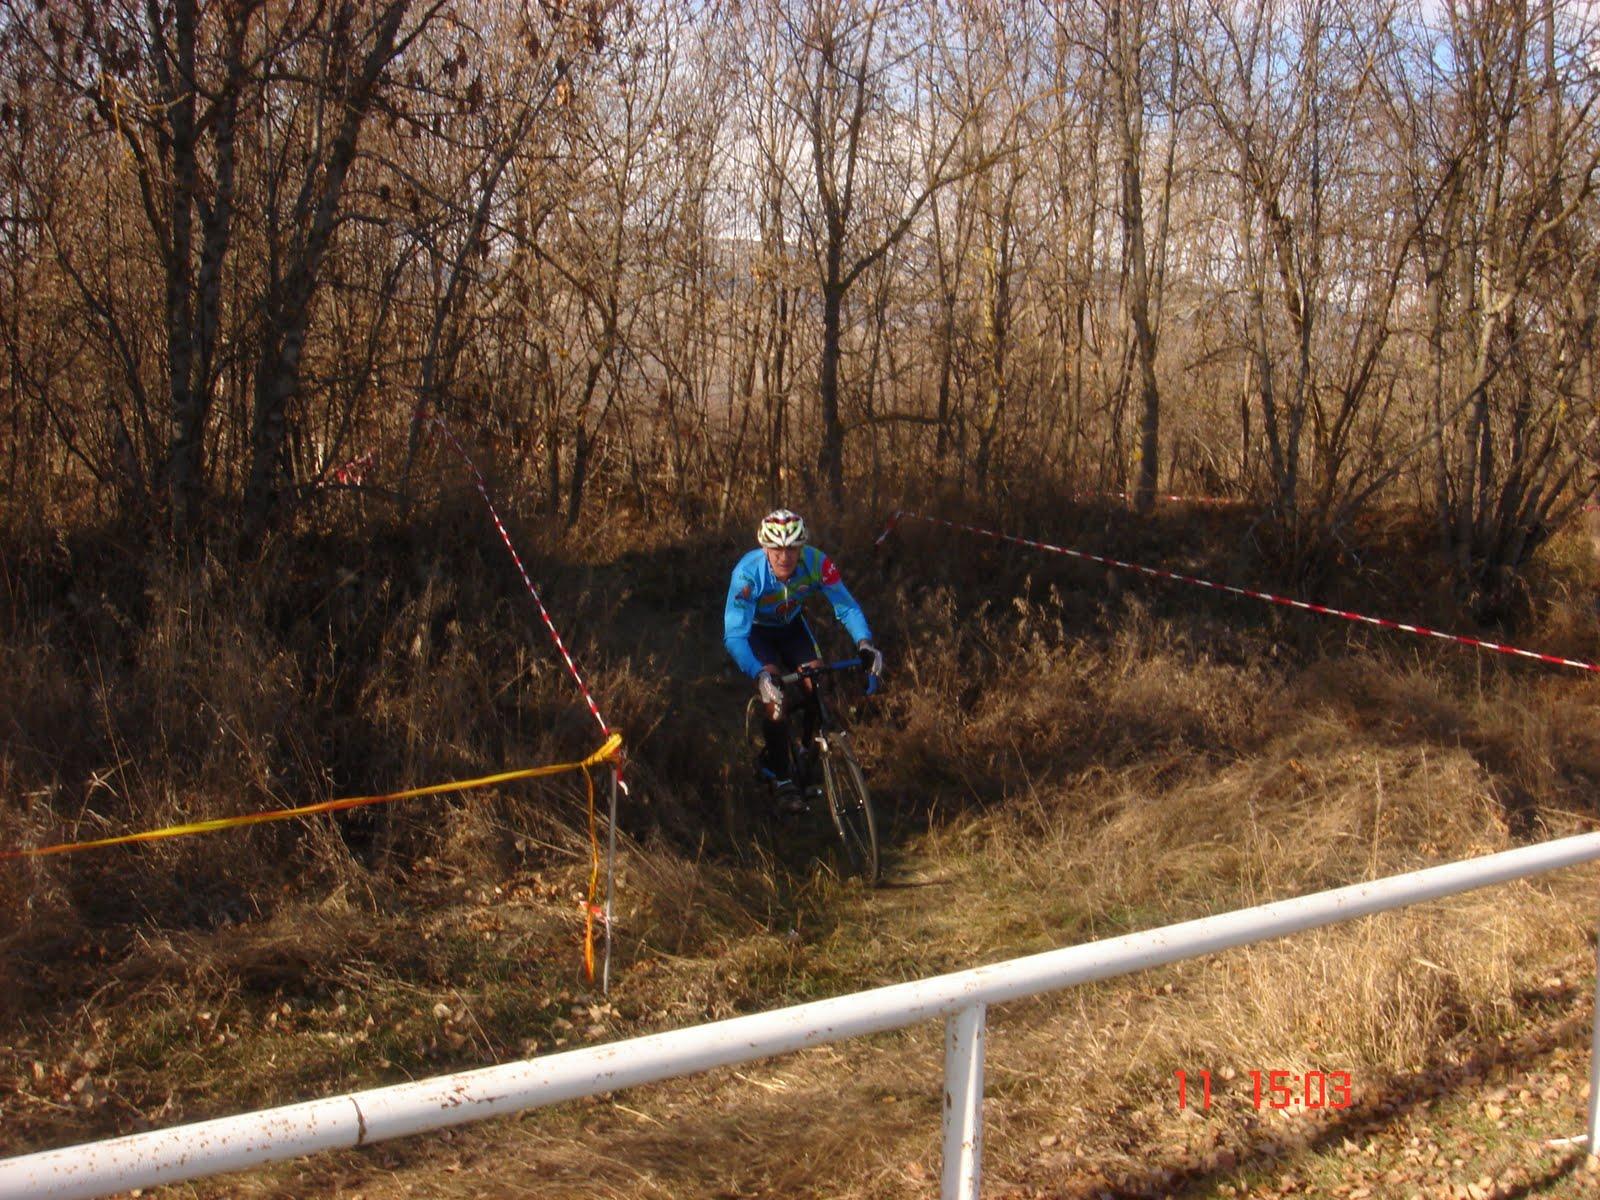 ... cyclocross que feian a bourg madame (frança) el costat de puigcerda